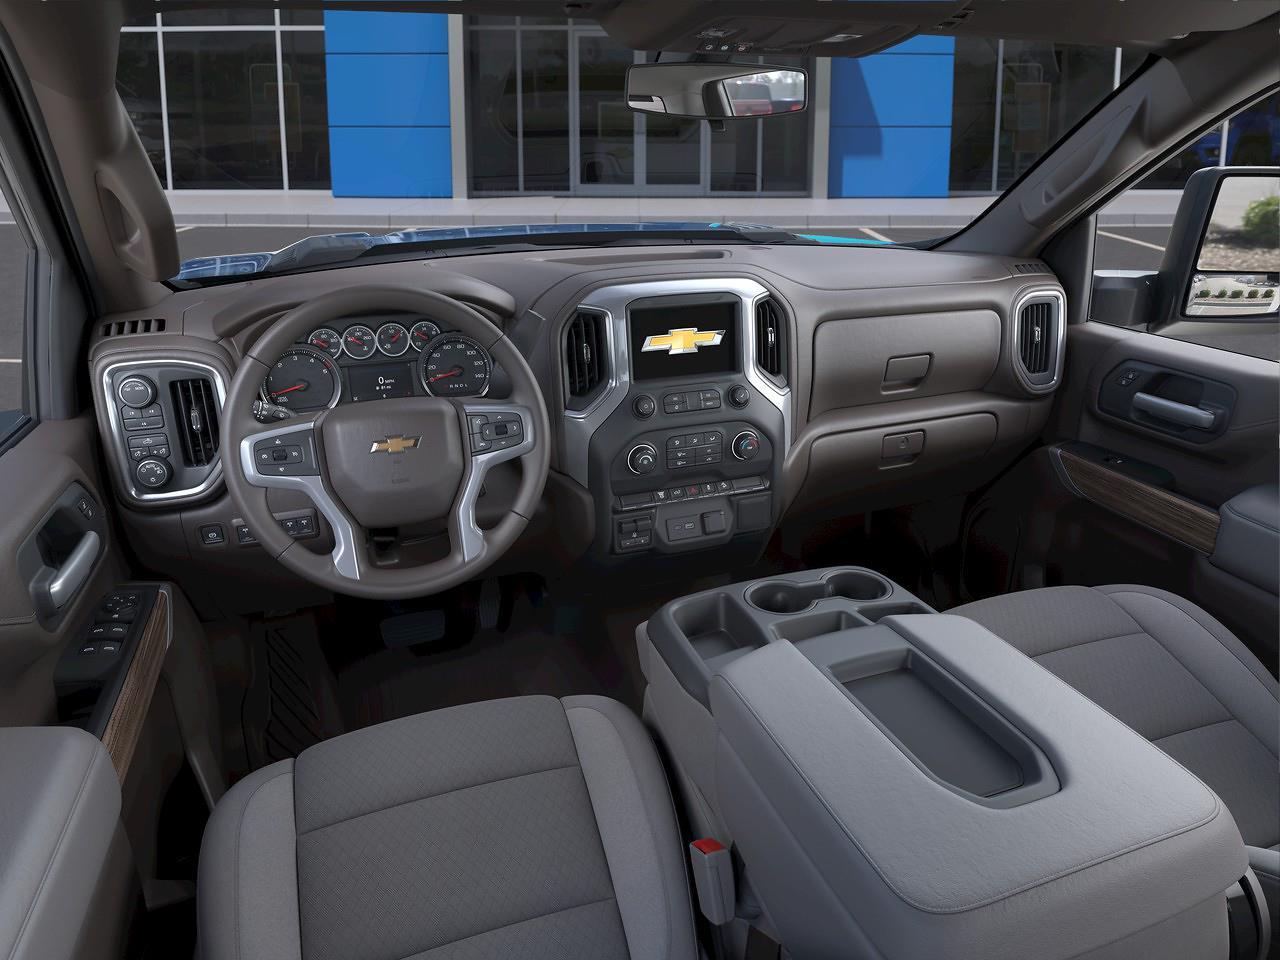 2021 Chevrolet Silverado 3500 Crew Cab 4x4, Pickup #Q210427 - photo 12